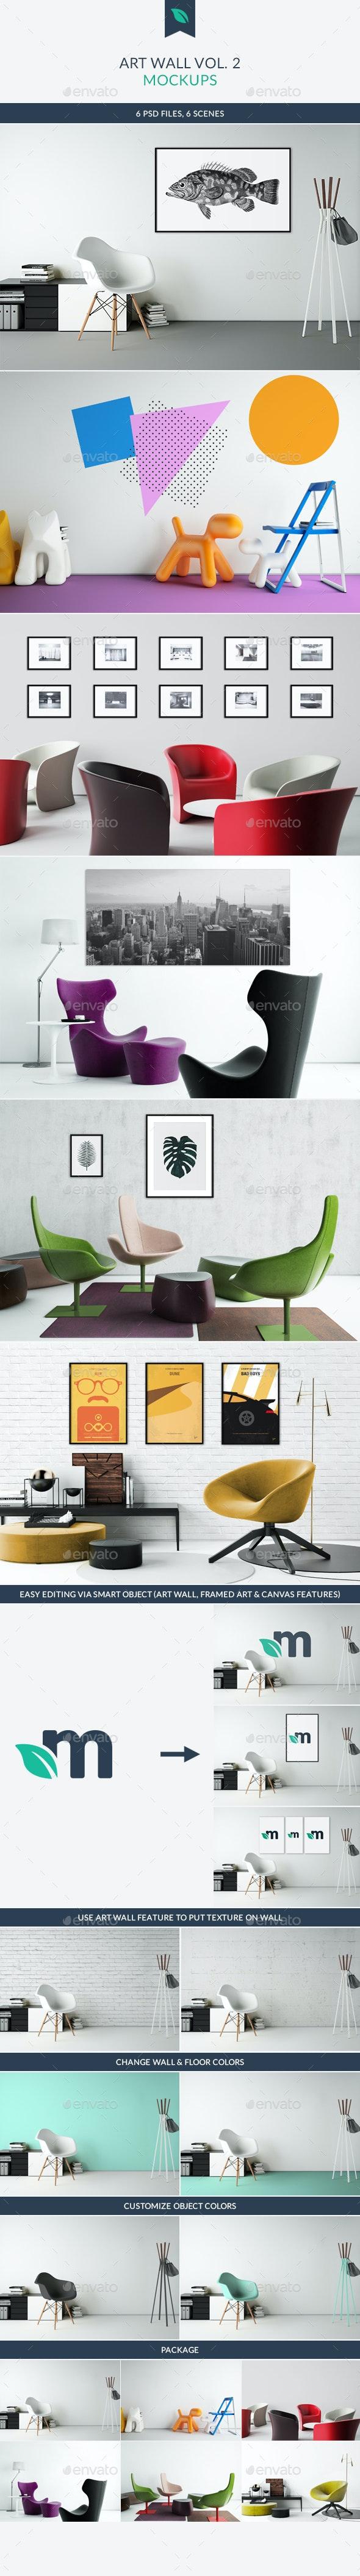 Art Wall Mockups Vol.2 - Miscellaneous Product Mock-Ups